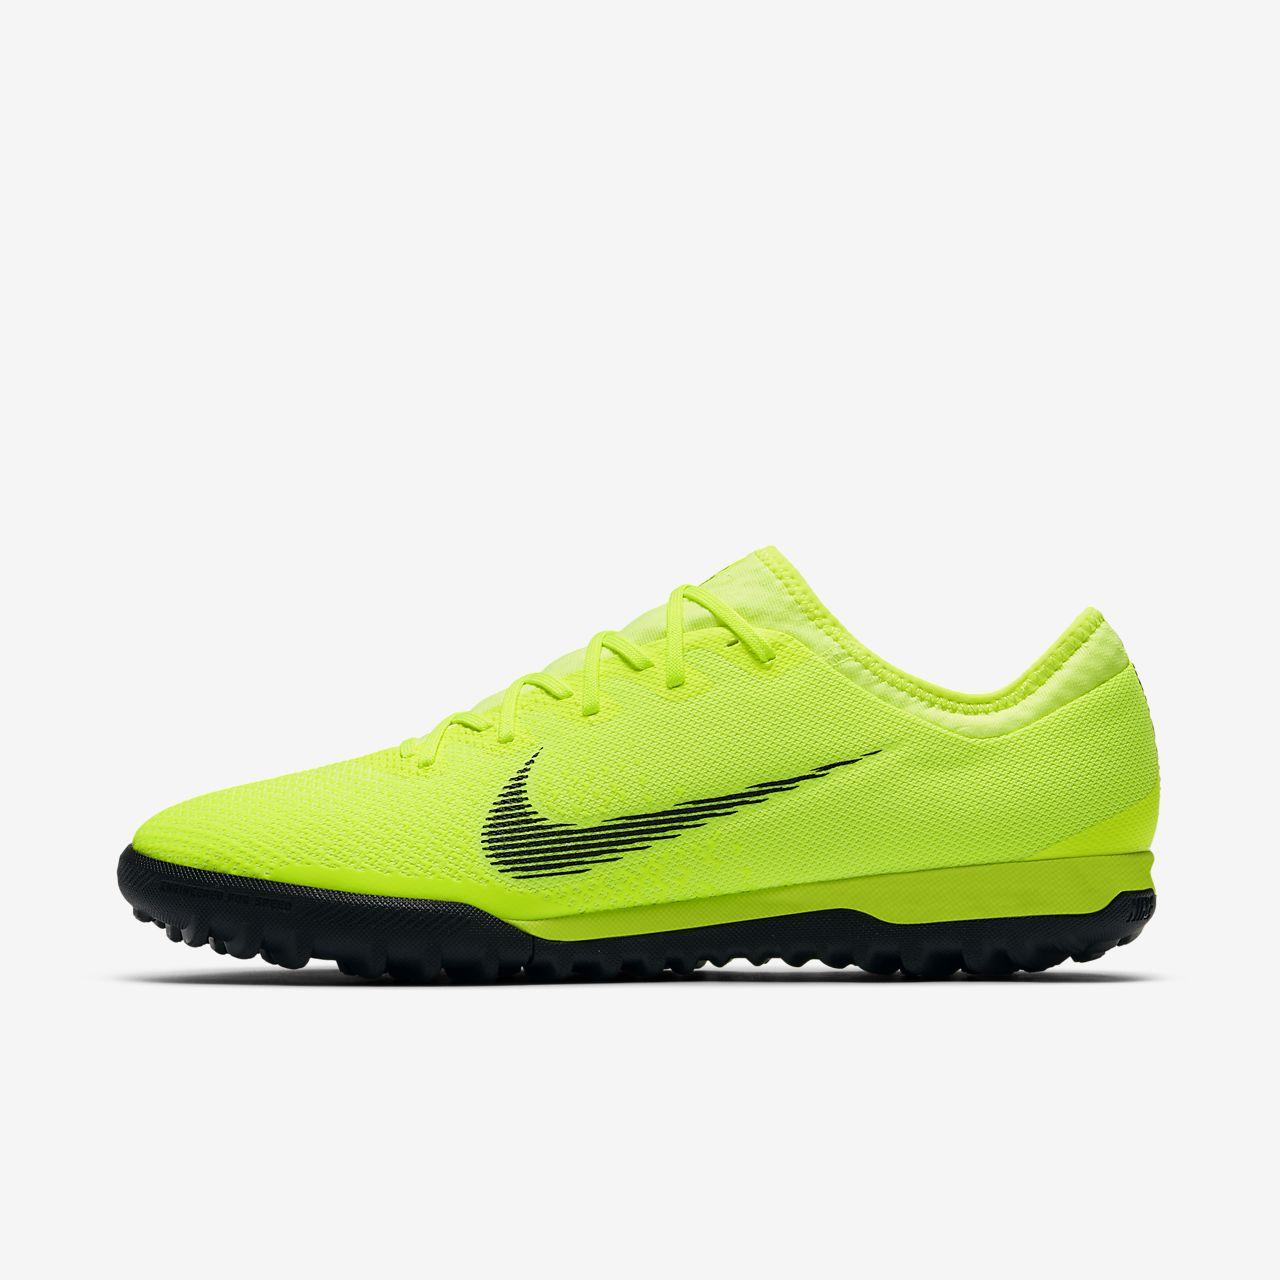 outlet store 26d97 f49c7 ... Nike MercurialX Vapor XII Pro TF Fußballschuh für Turf